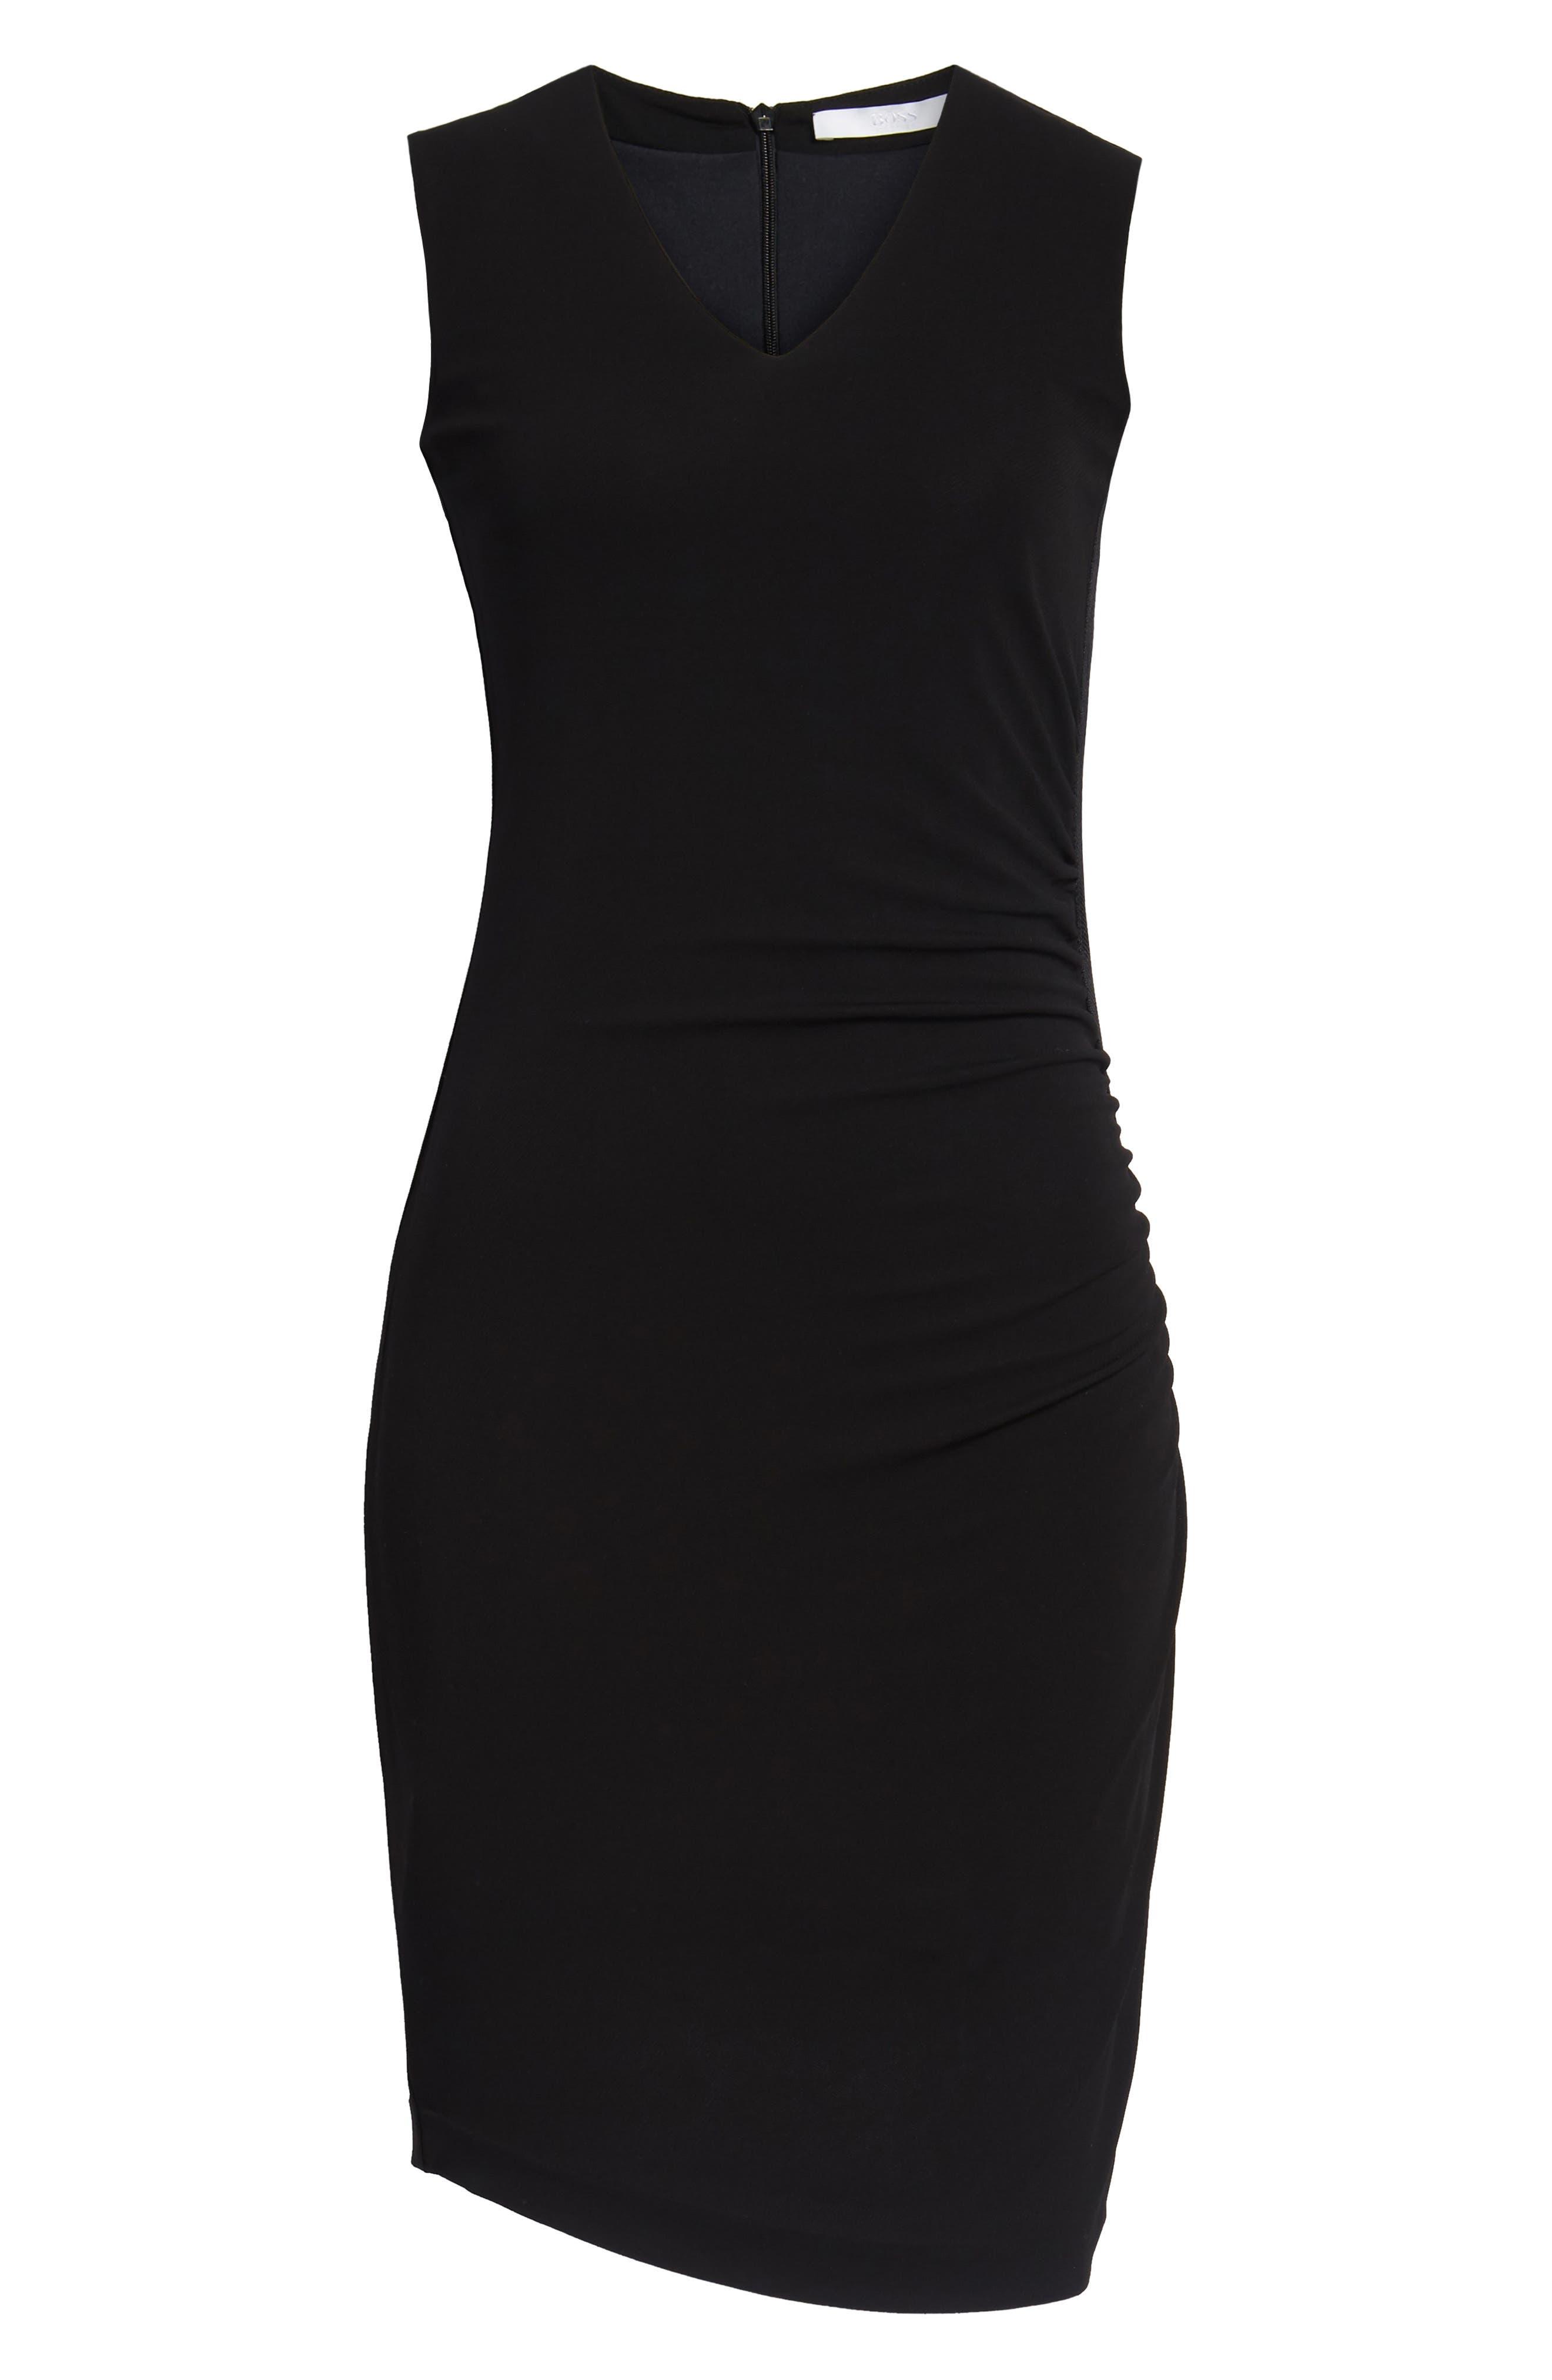 Erela Ruched Sheath Dress,                             Alternate thumbnail 7, color,                             Black